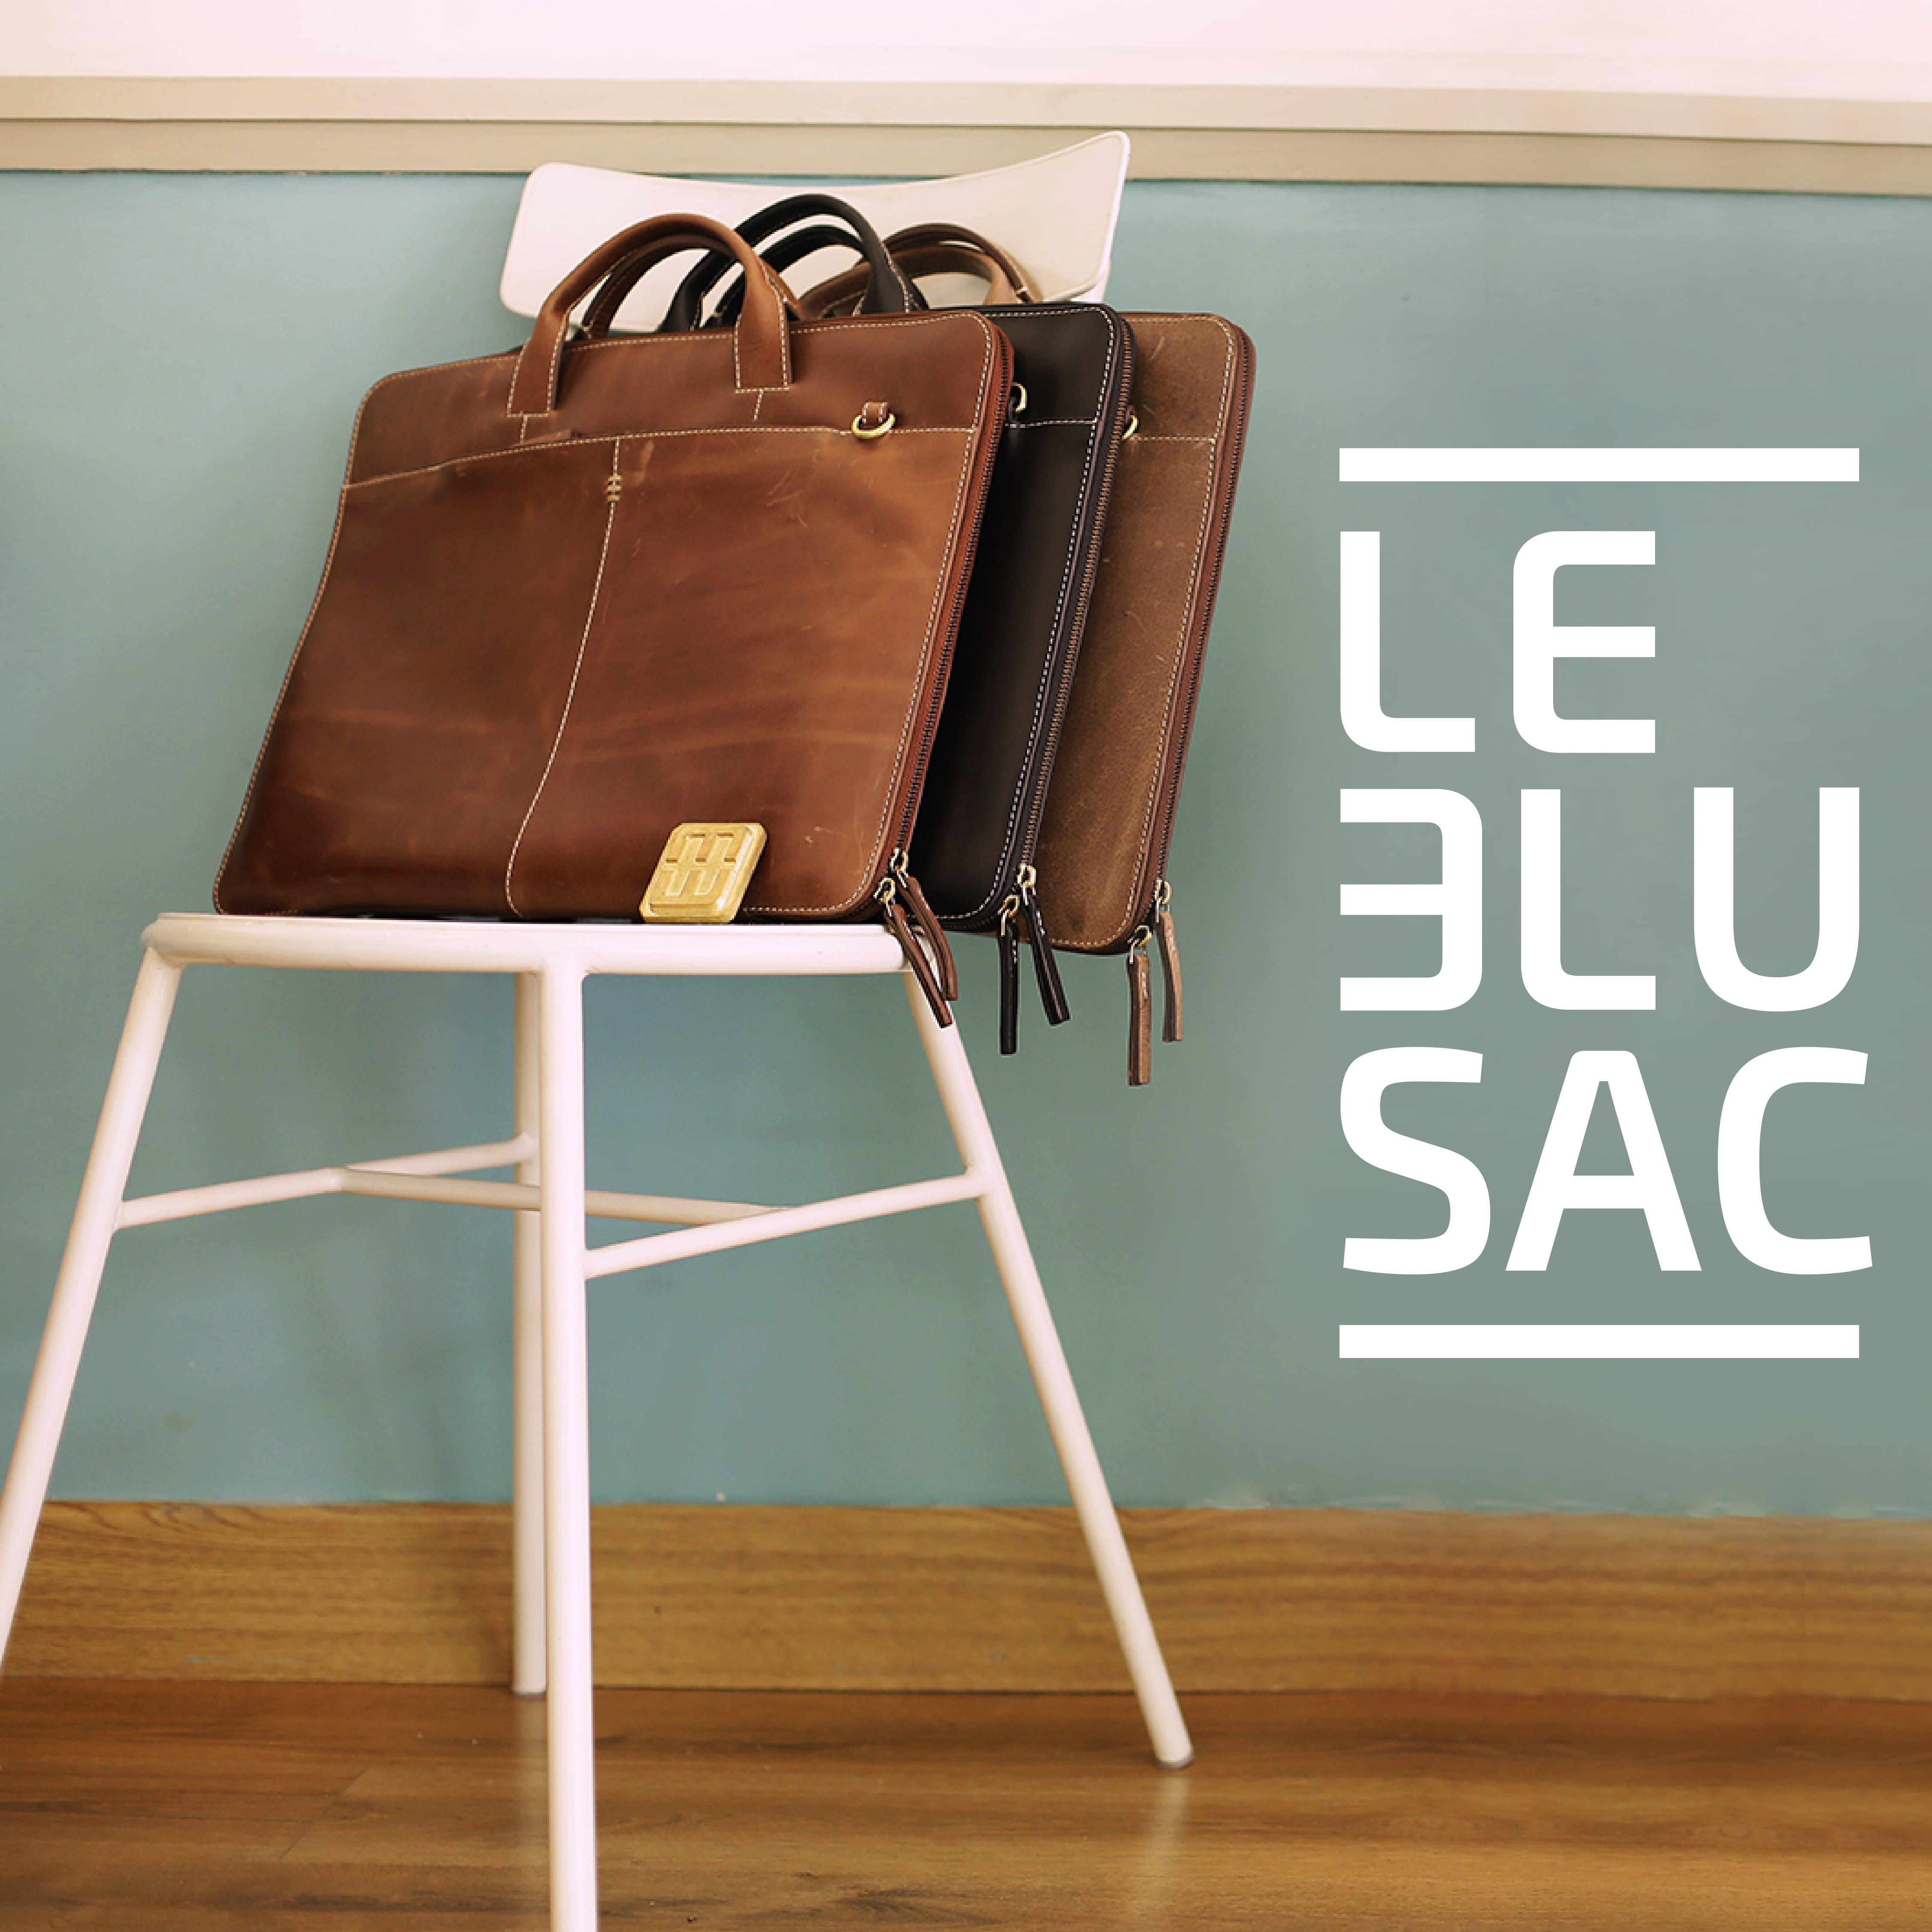 le blu sac_03-min